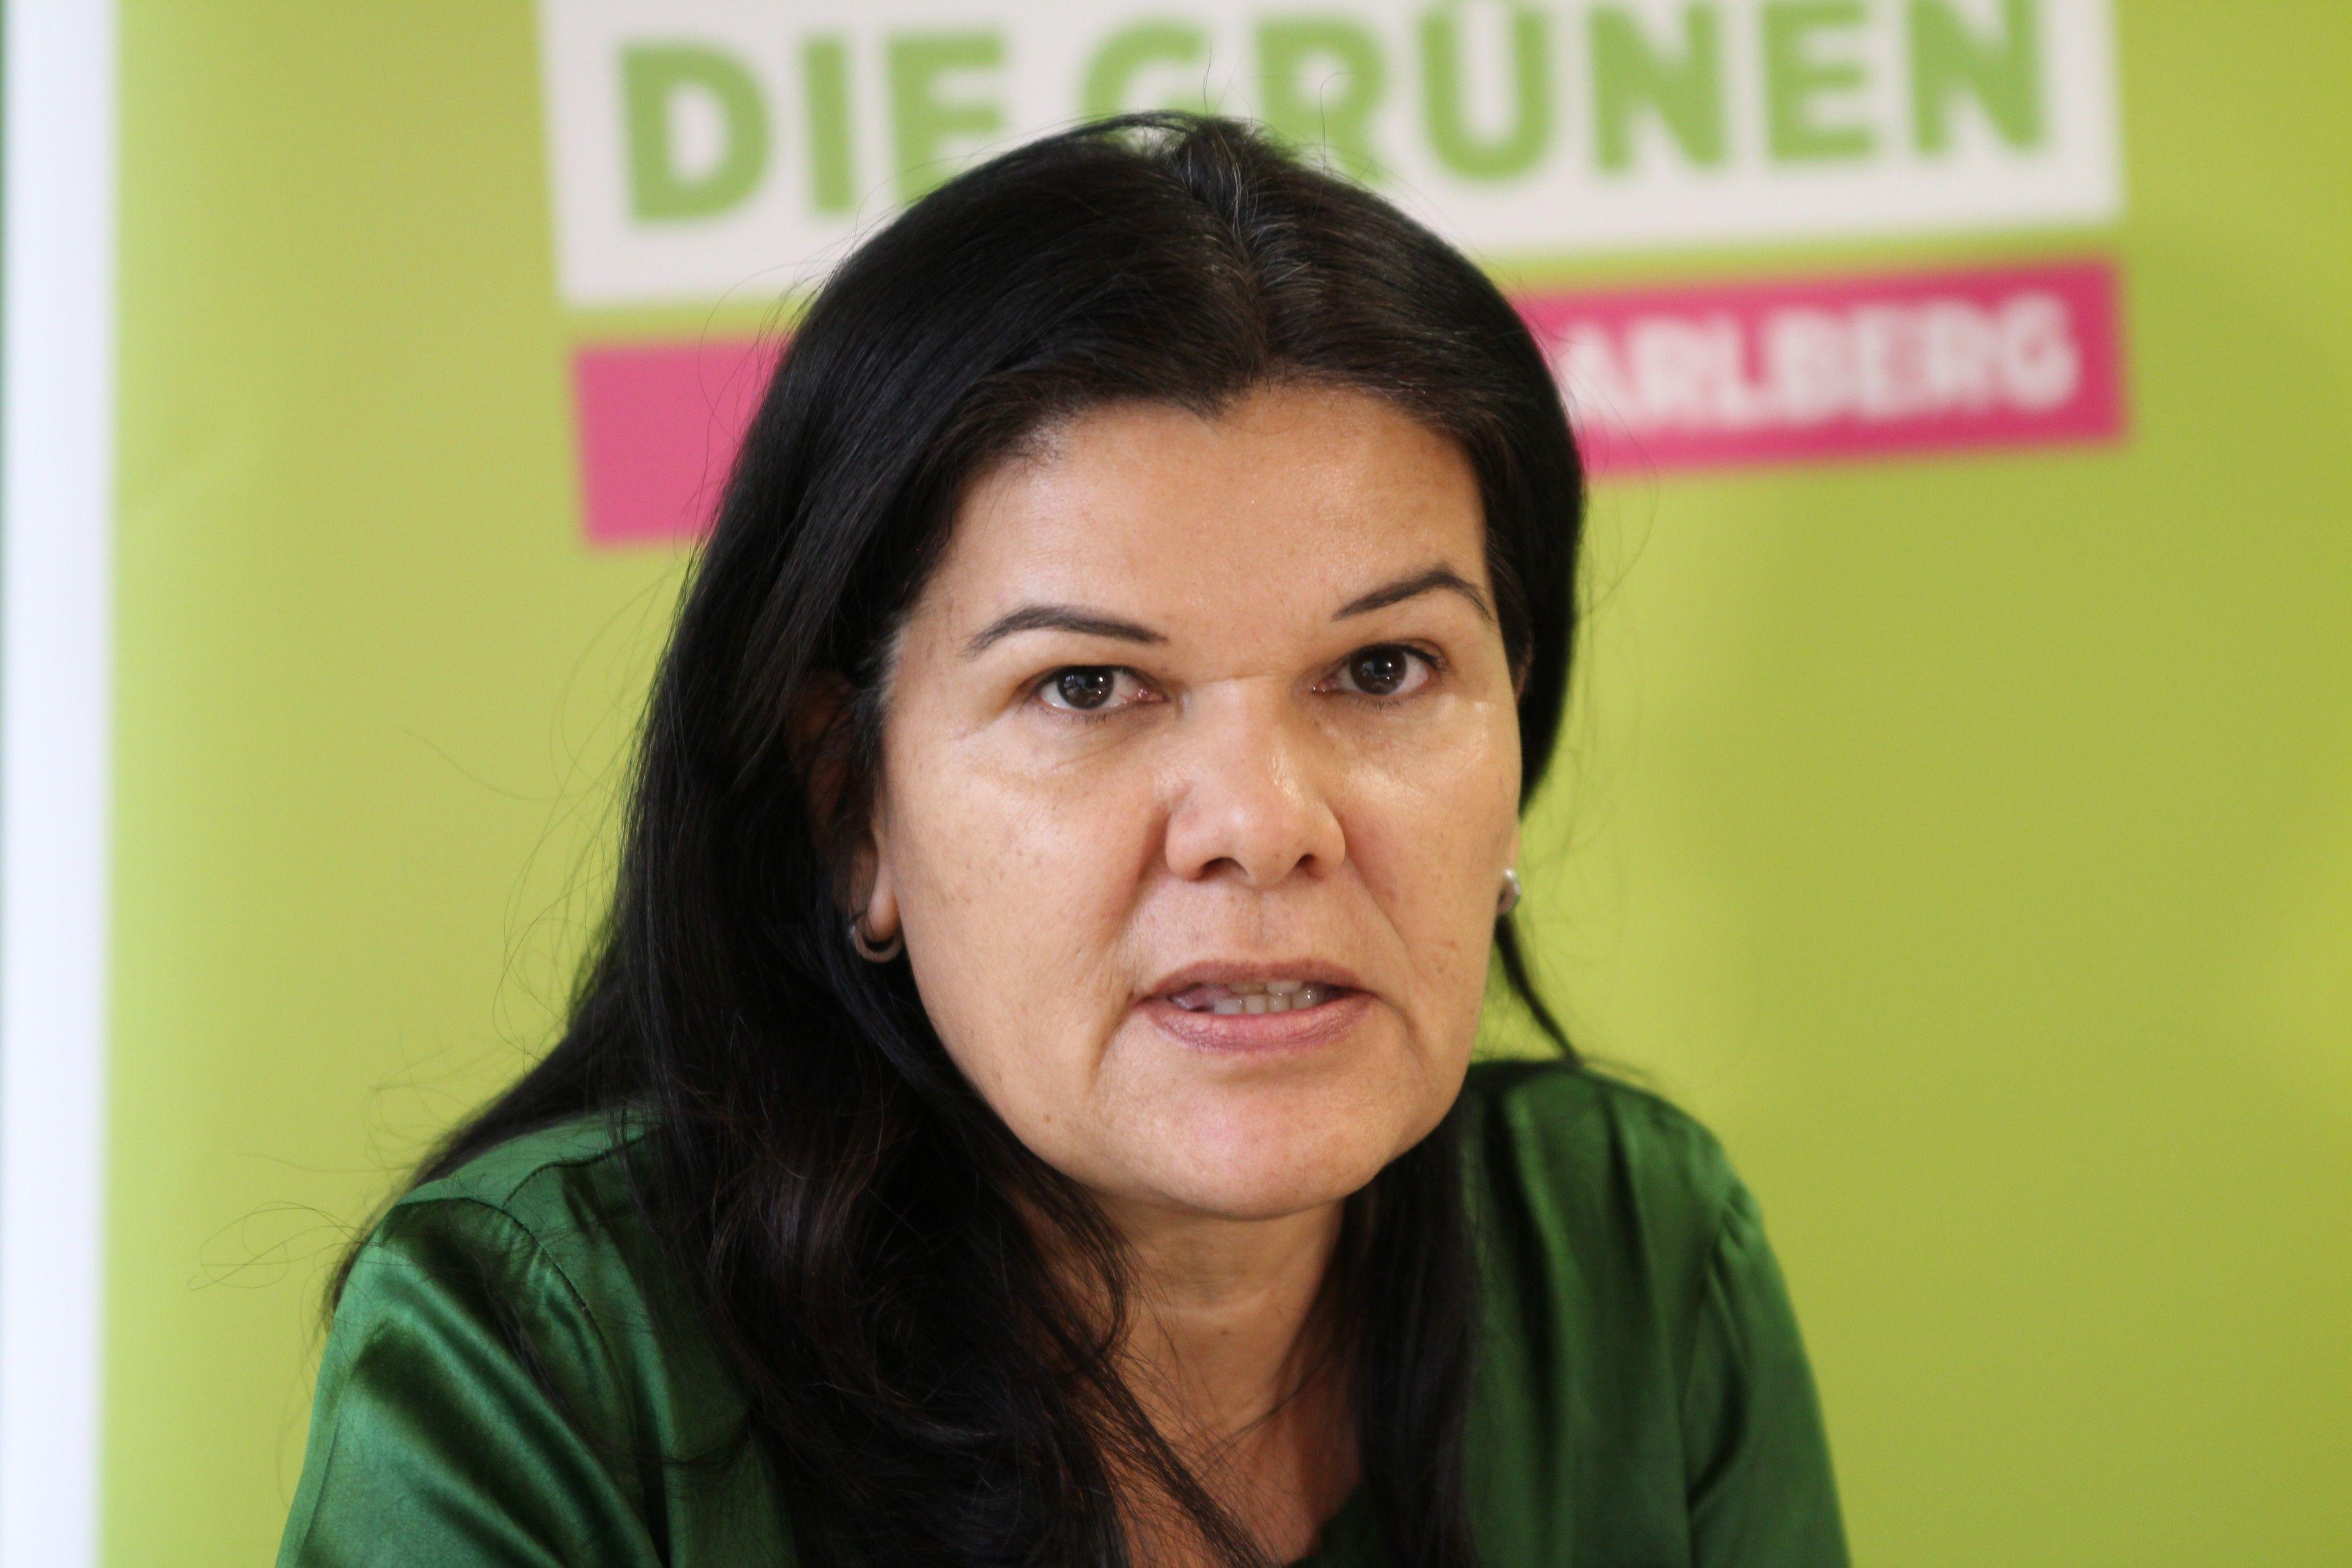 IfS-Kontrollausschuss: Regierung wehrt sich gegen FPÖ-Angriff